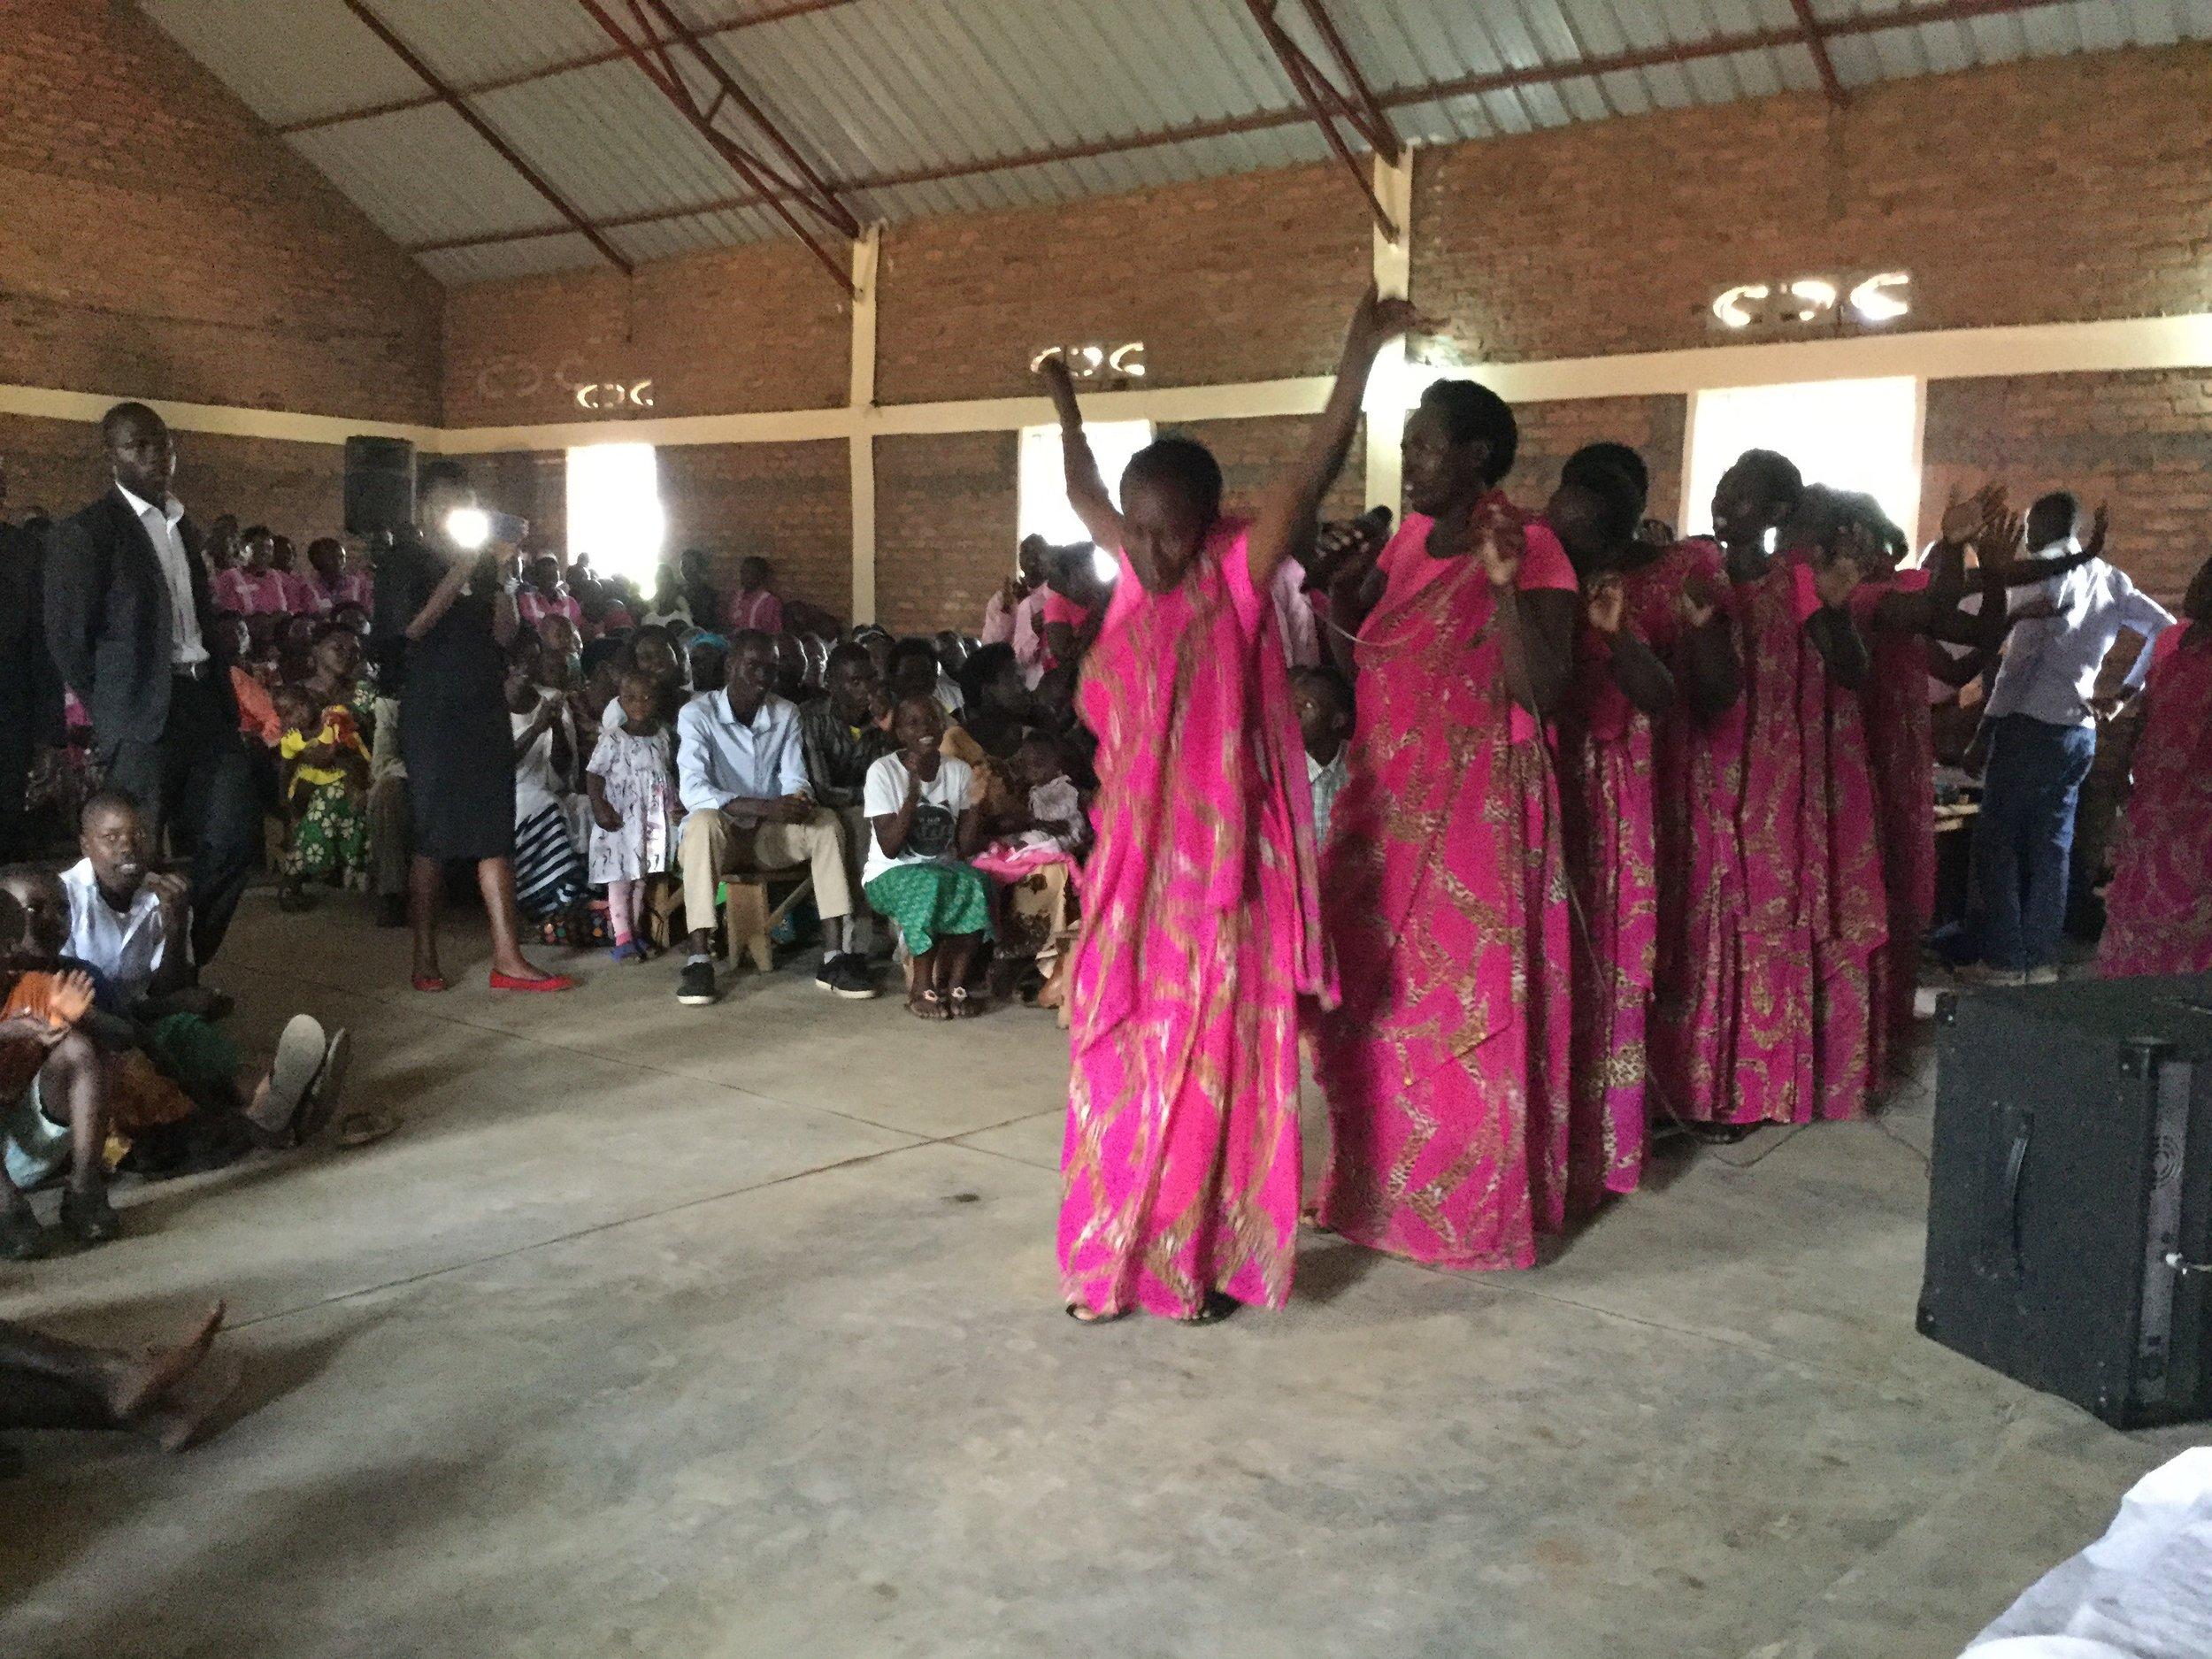 Rwanda-Church-Construction-October-2017-update-dancers-Karambi.jpg